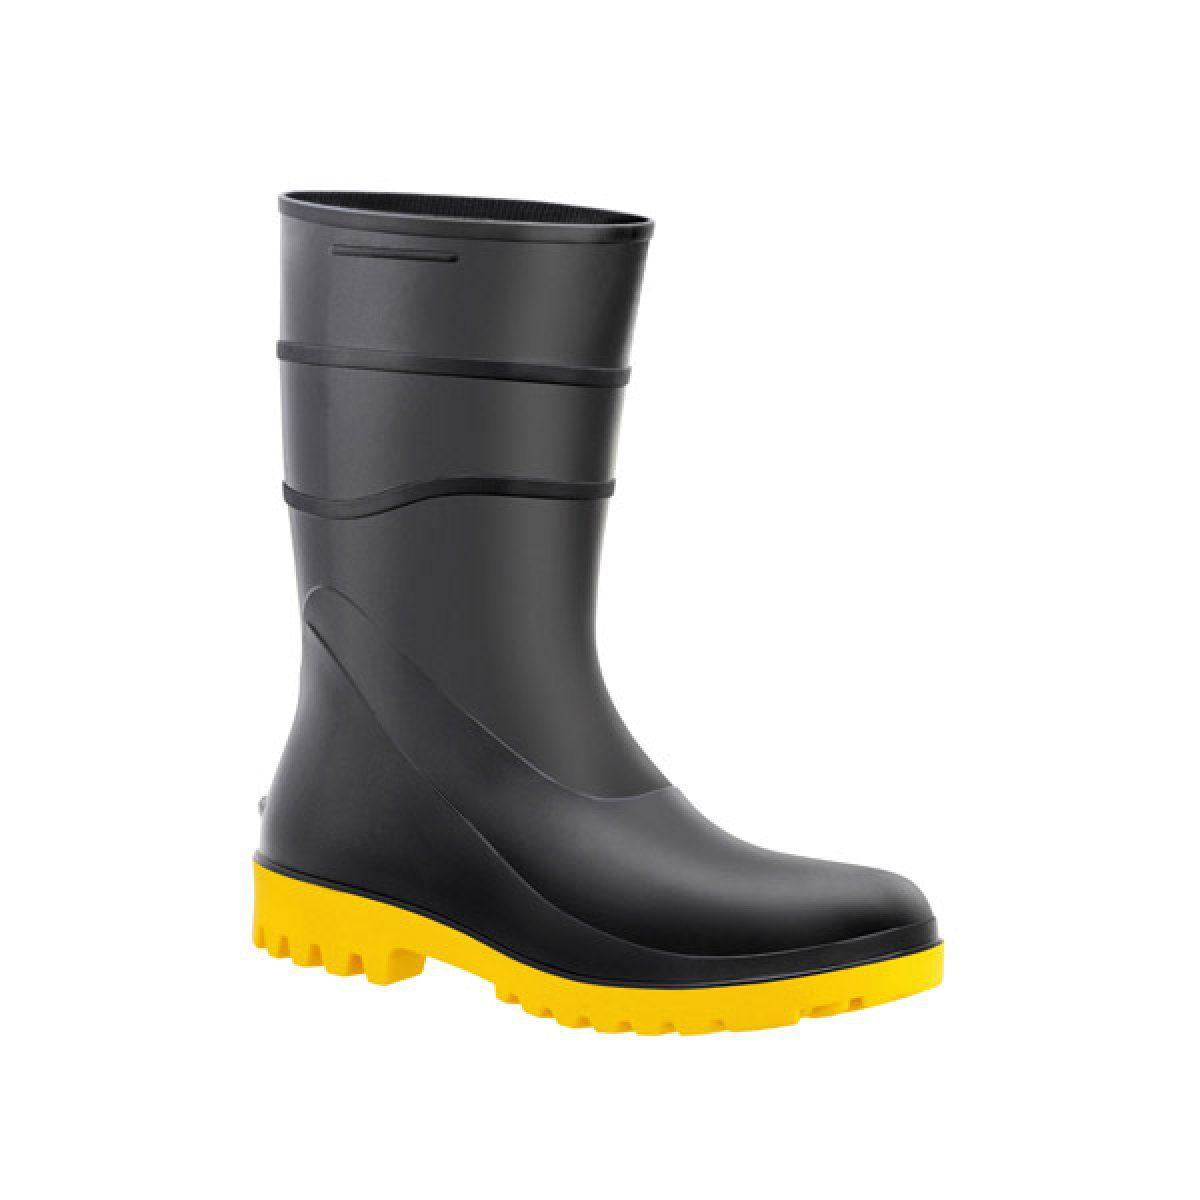 Bota de PVC Preta c/ Solado Amarelo N°37 - BRACOL